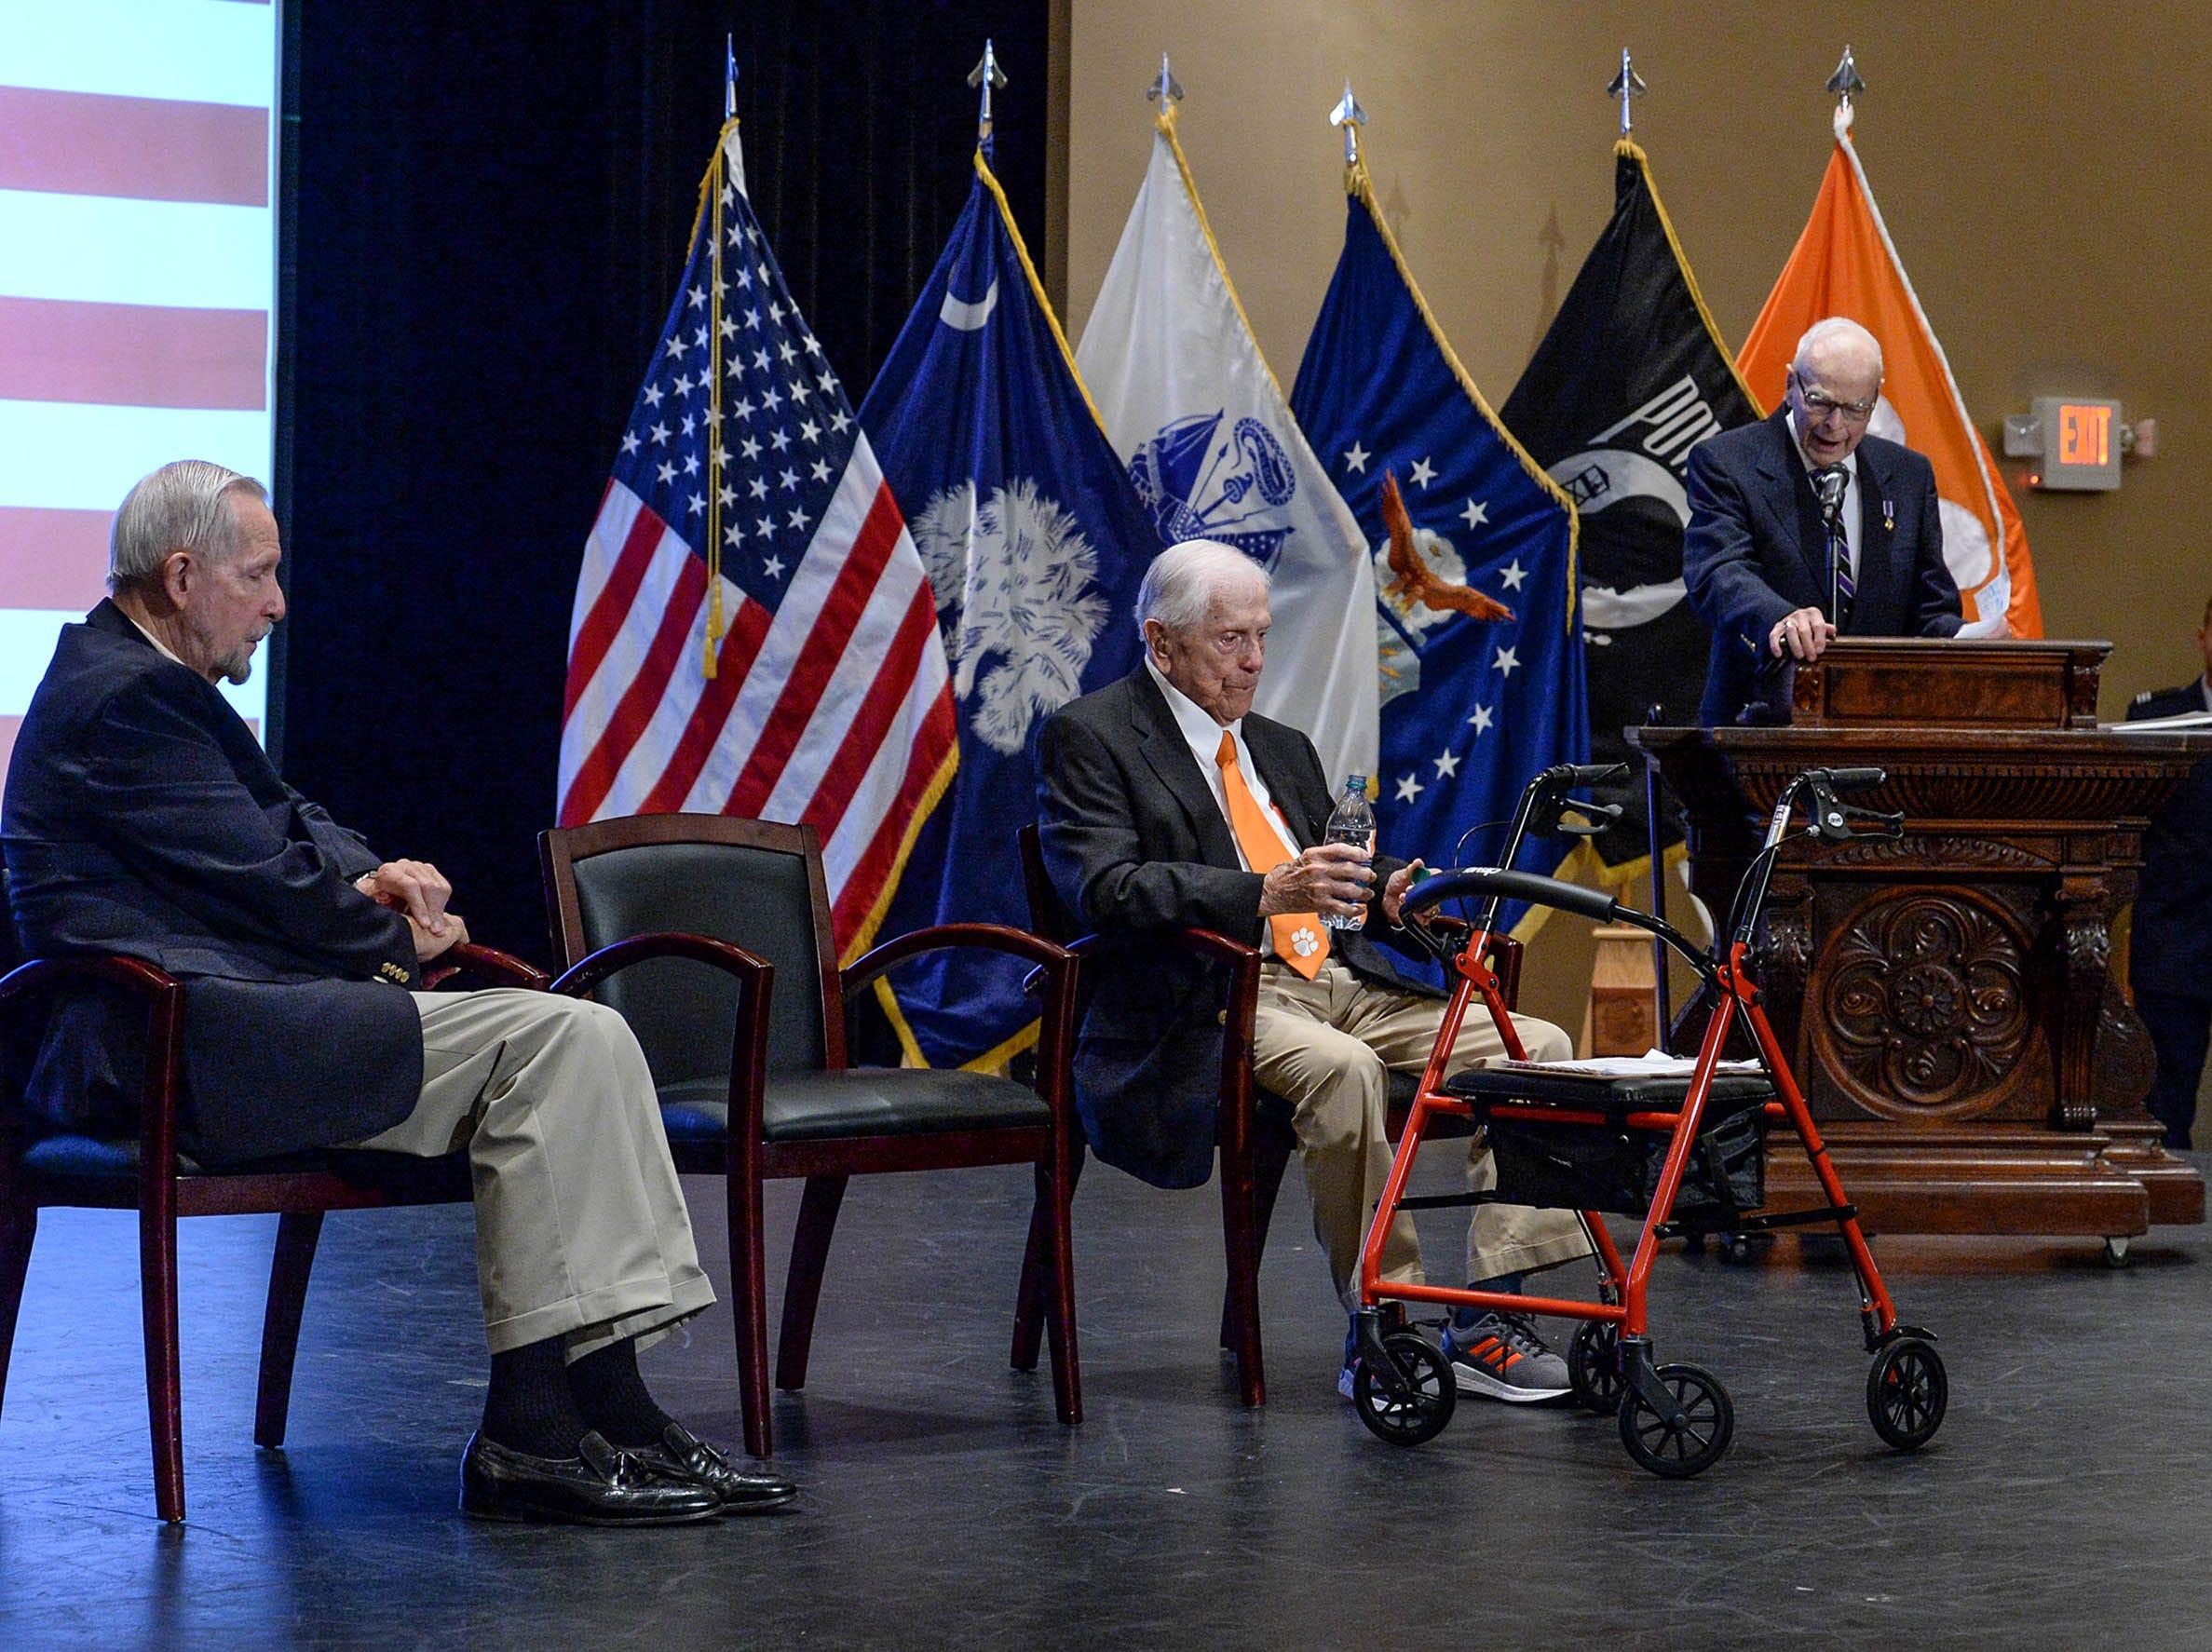 Clemson University invited three Living Prisoners of War to speak in Tillman Hall at Clemson University on Thursday.  Col. Ben Skardon, middle, 1st Lt. Bill Funchess speaking, and Col. Bill Austin, left, at the event.